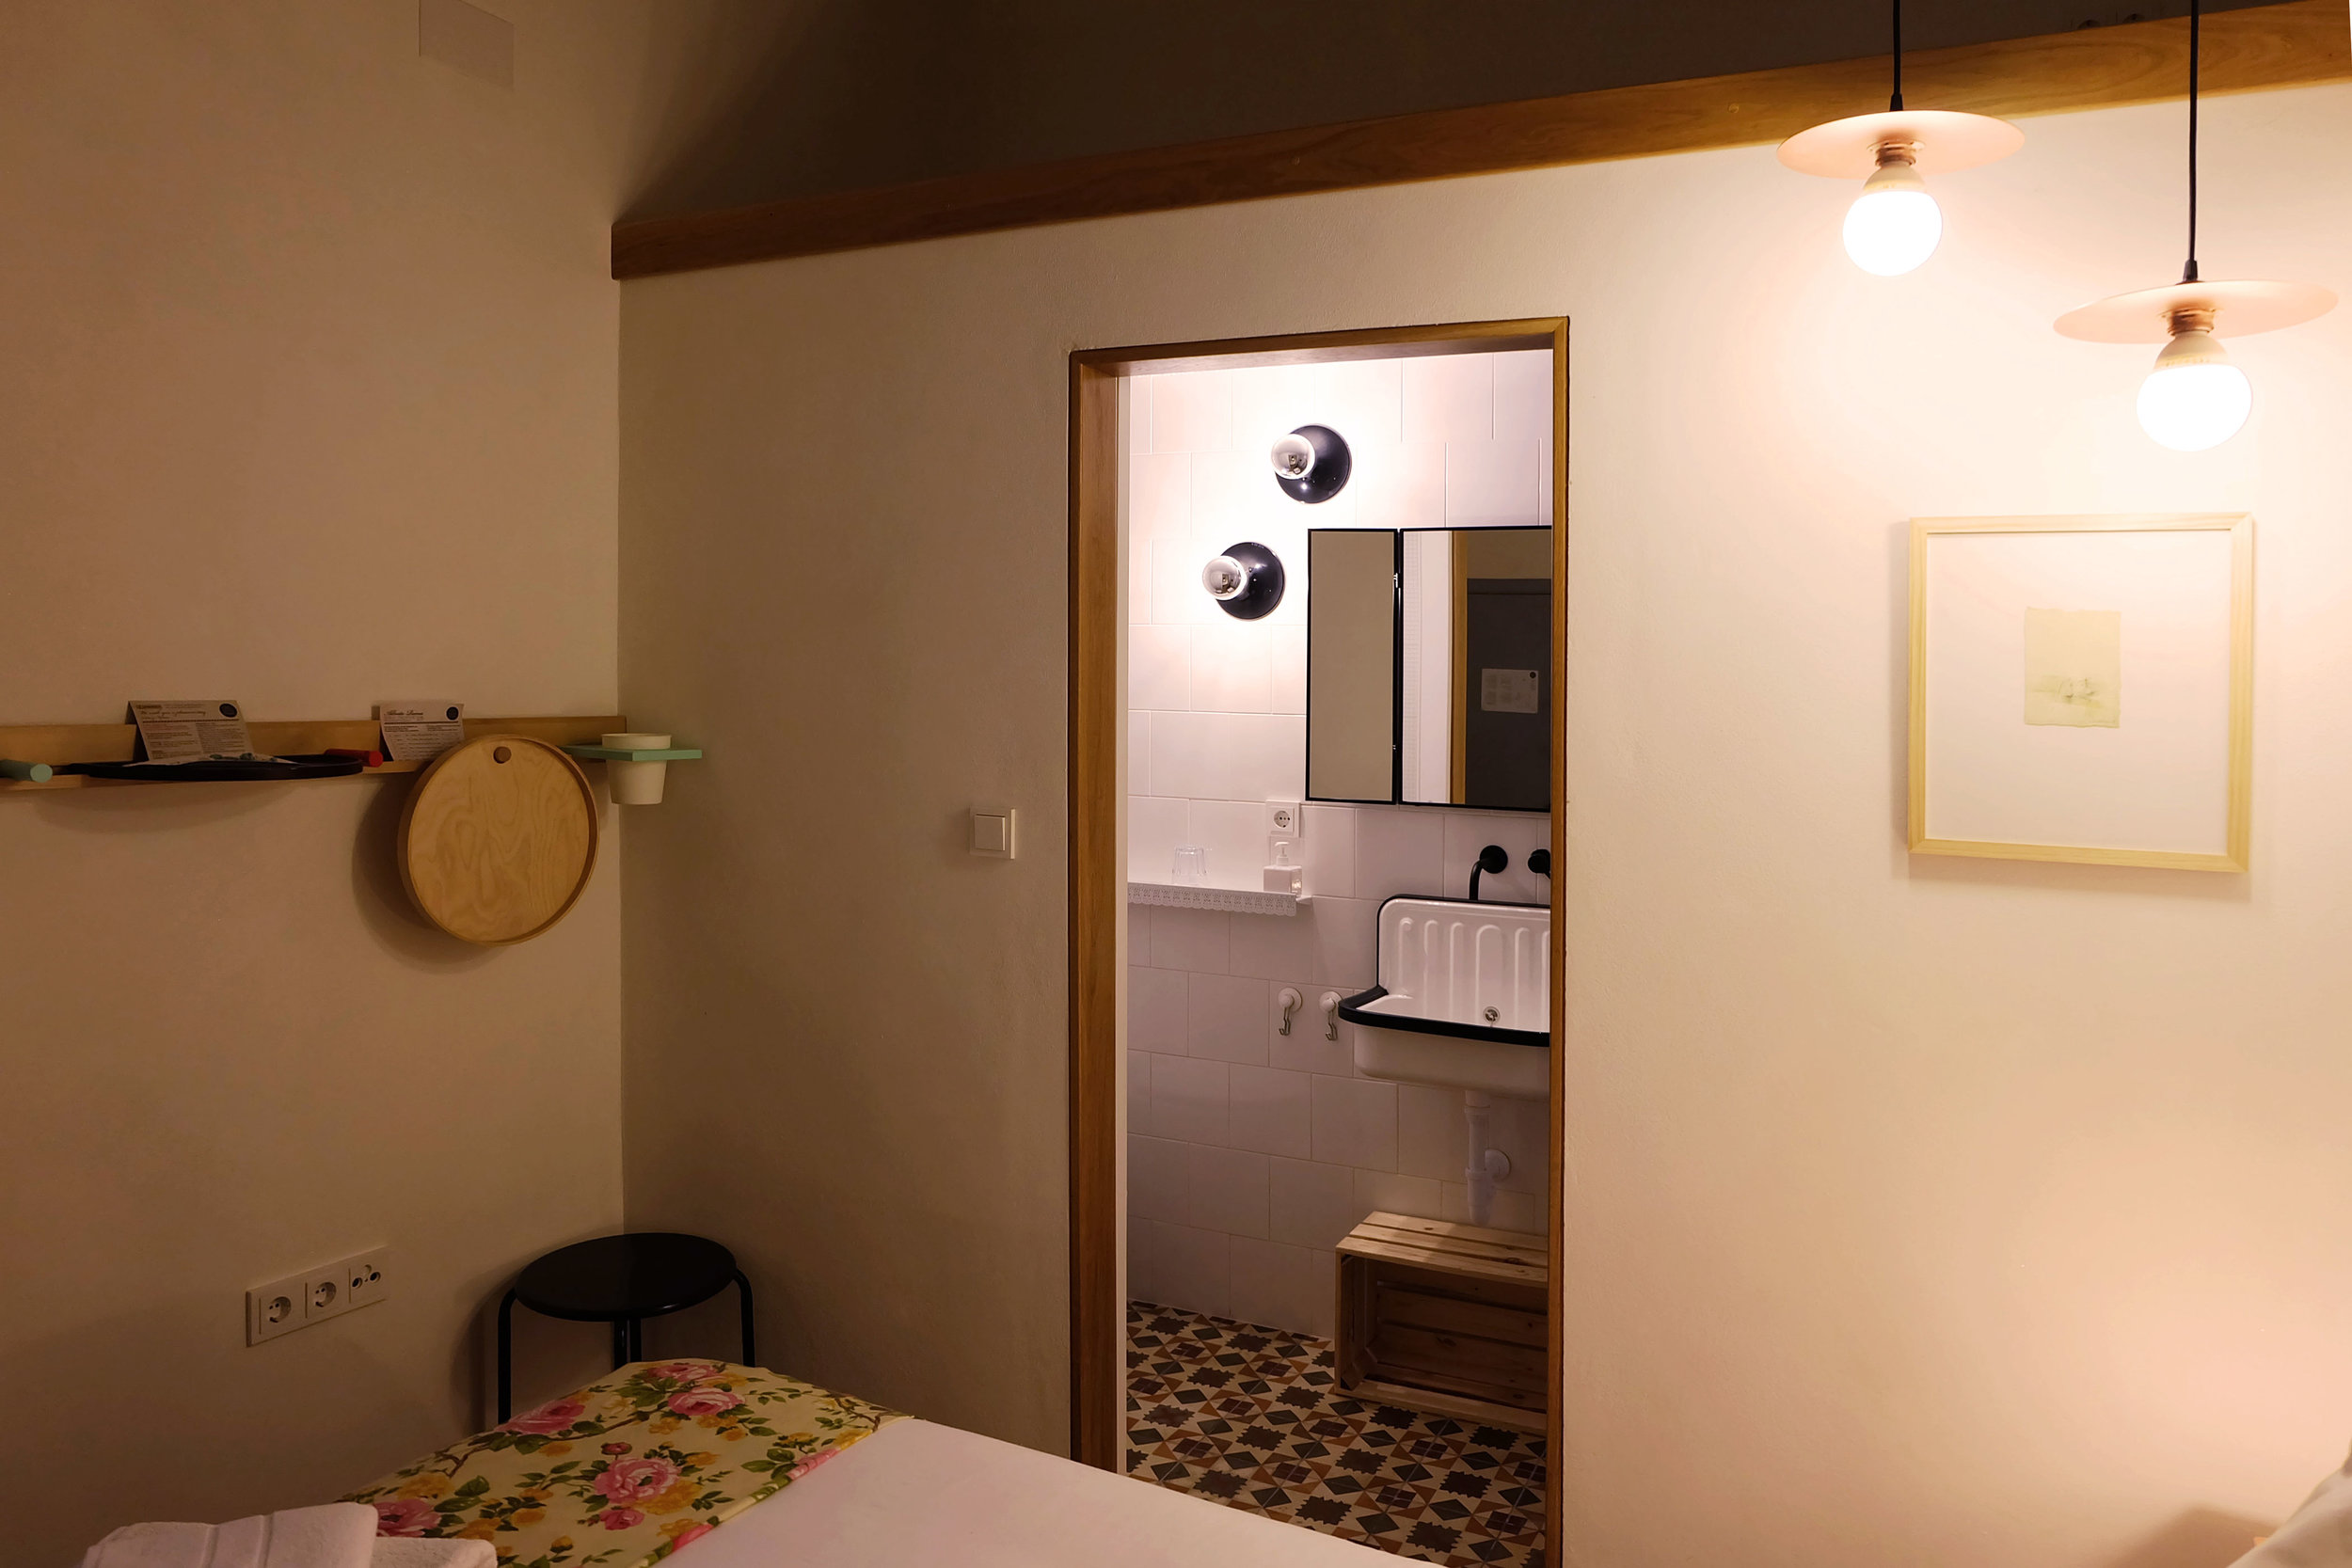 Hotel-Casa-de-Huespedes-Santa-Maria-Habitacion-10-10.jpg